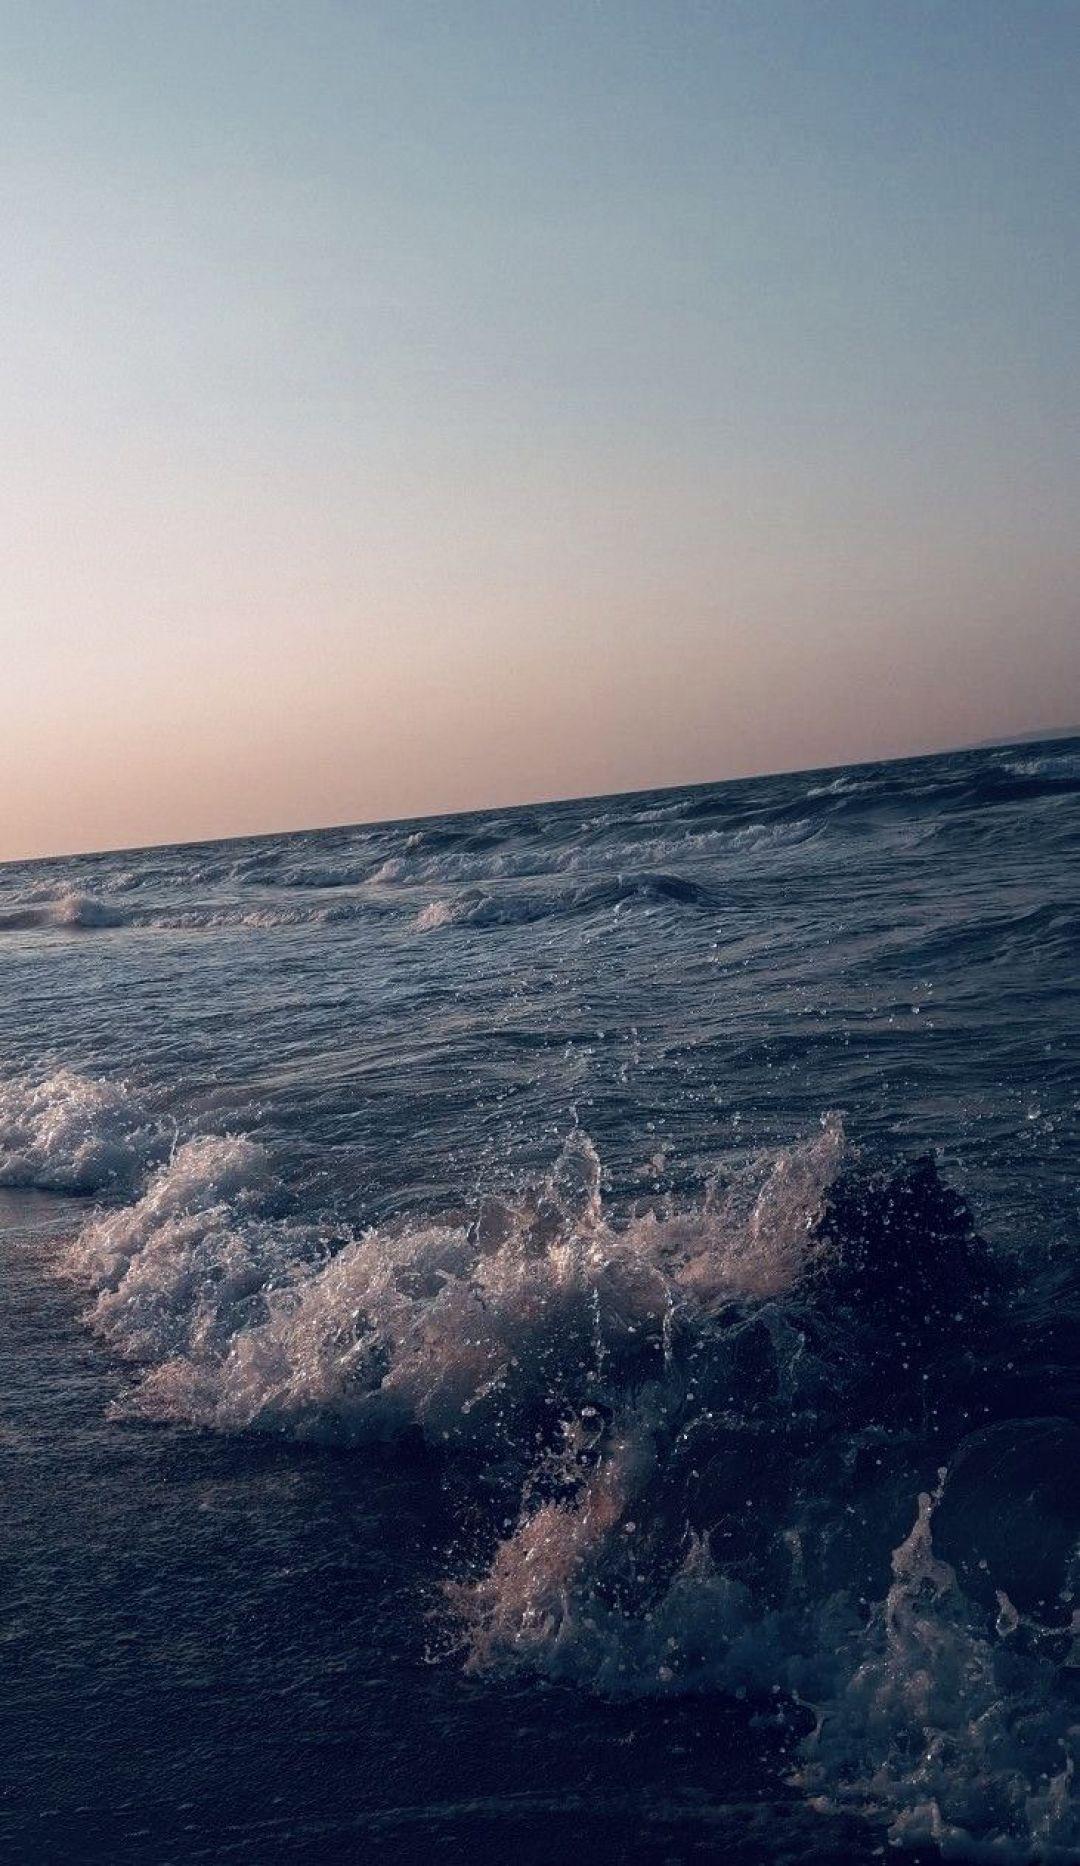 Ocean Android Iphone Desktop Hd Backgrounds Wallpapers 1080p 4k 118024 Hdwallpapers Androidwallpap Ocean Wallpaper Sky Aesthetic Nature Wallpaper